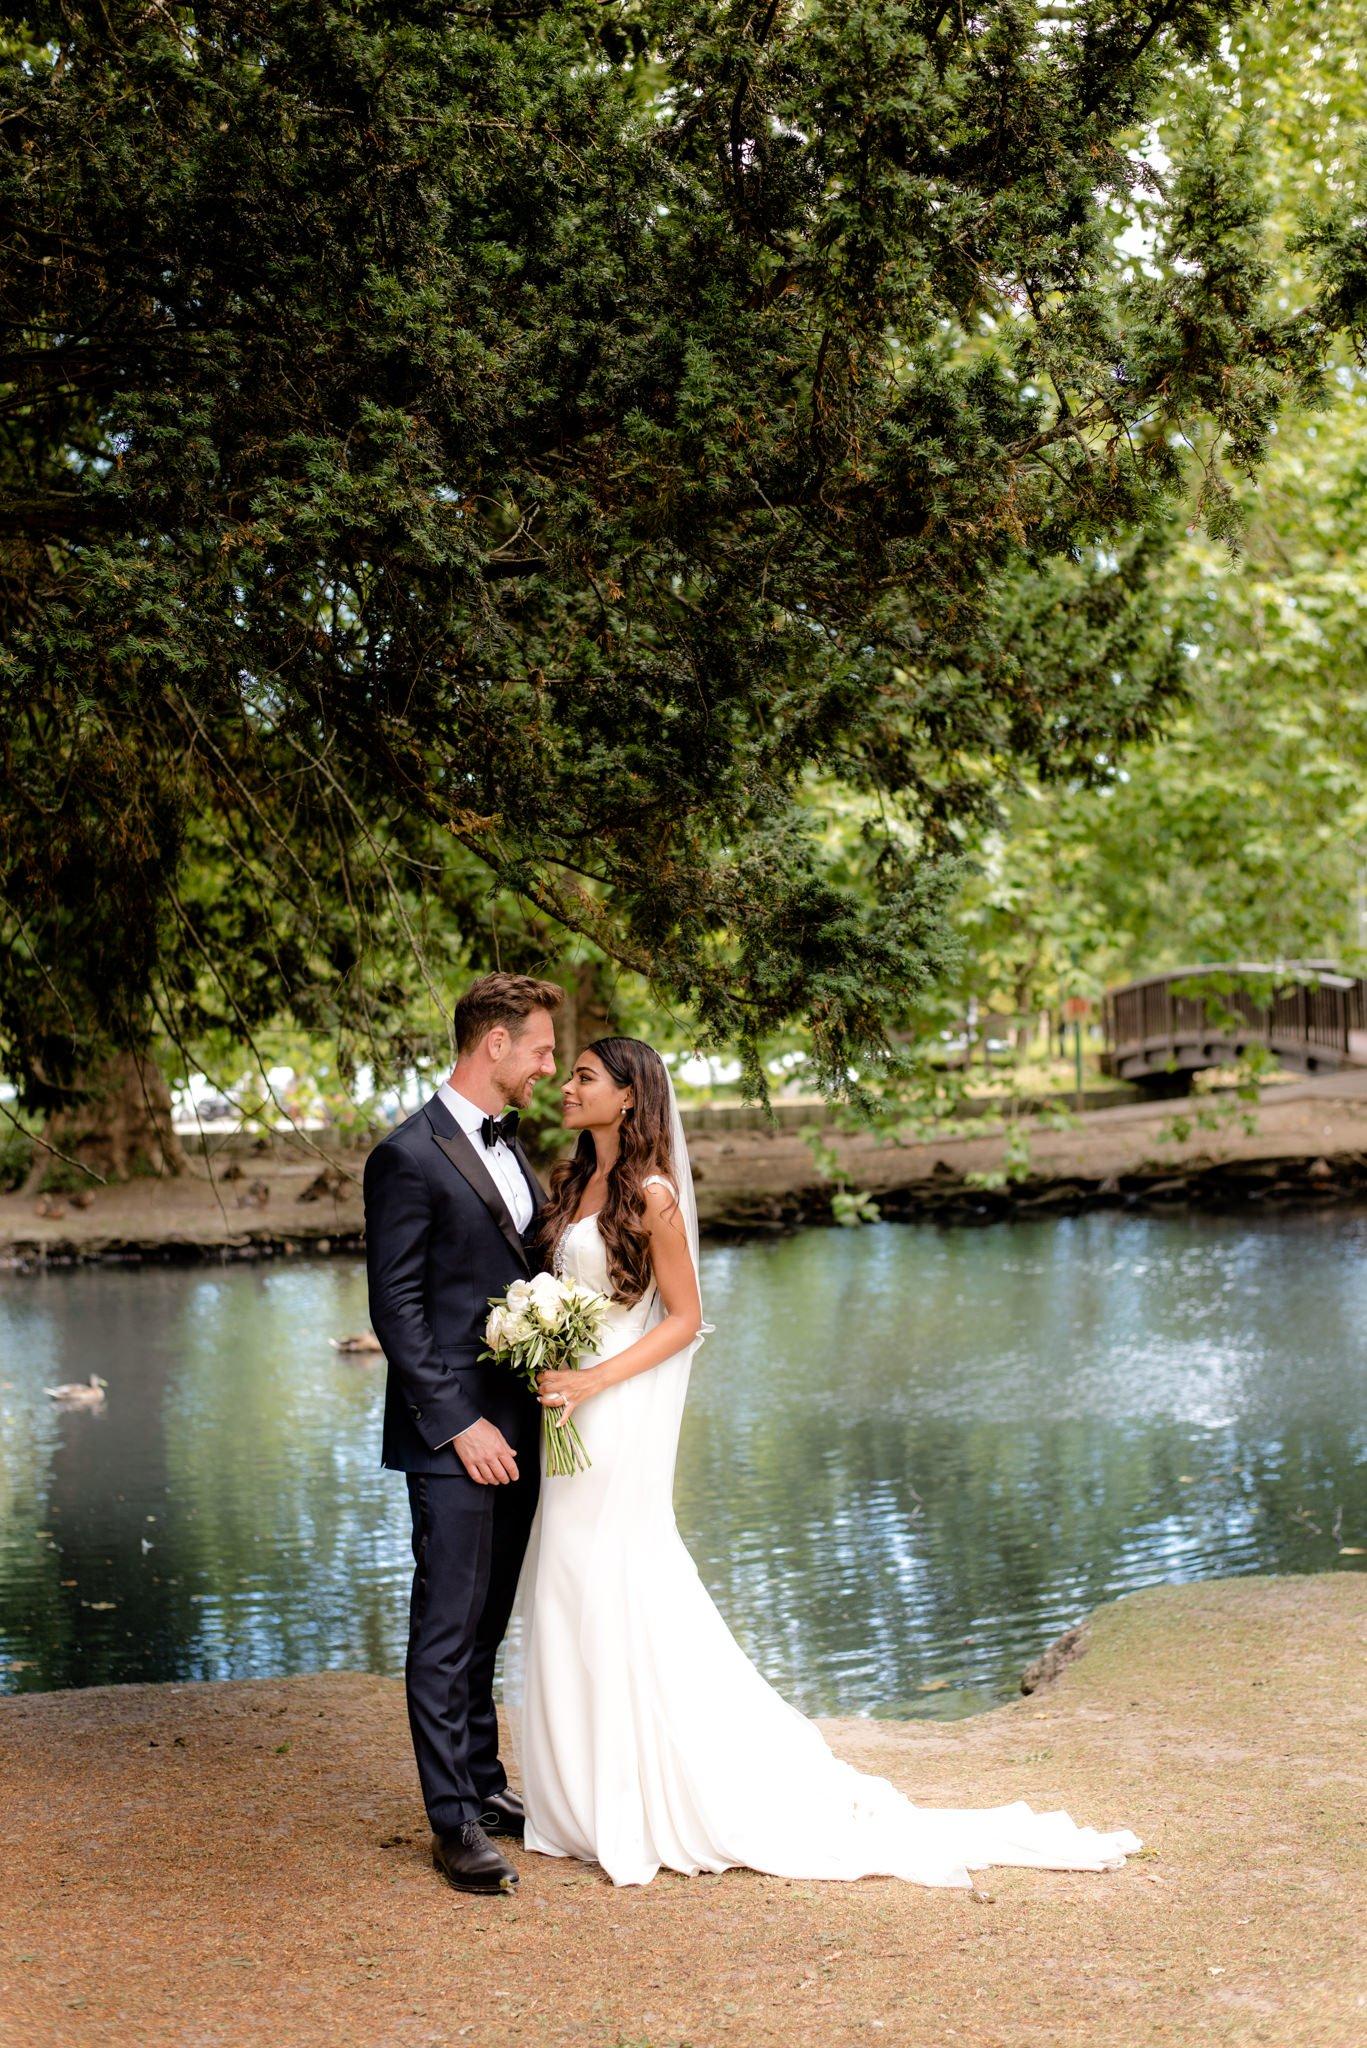 Weddings in Hertfordshire